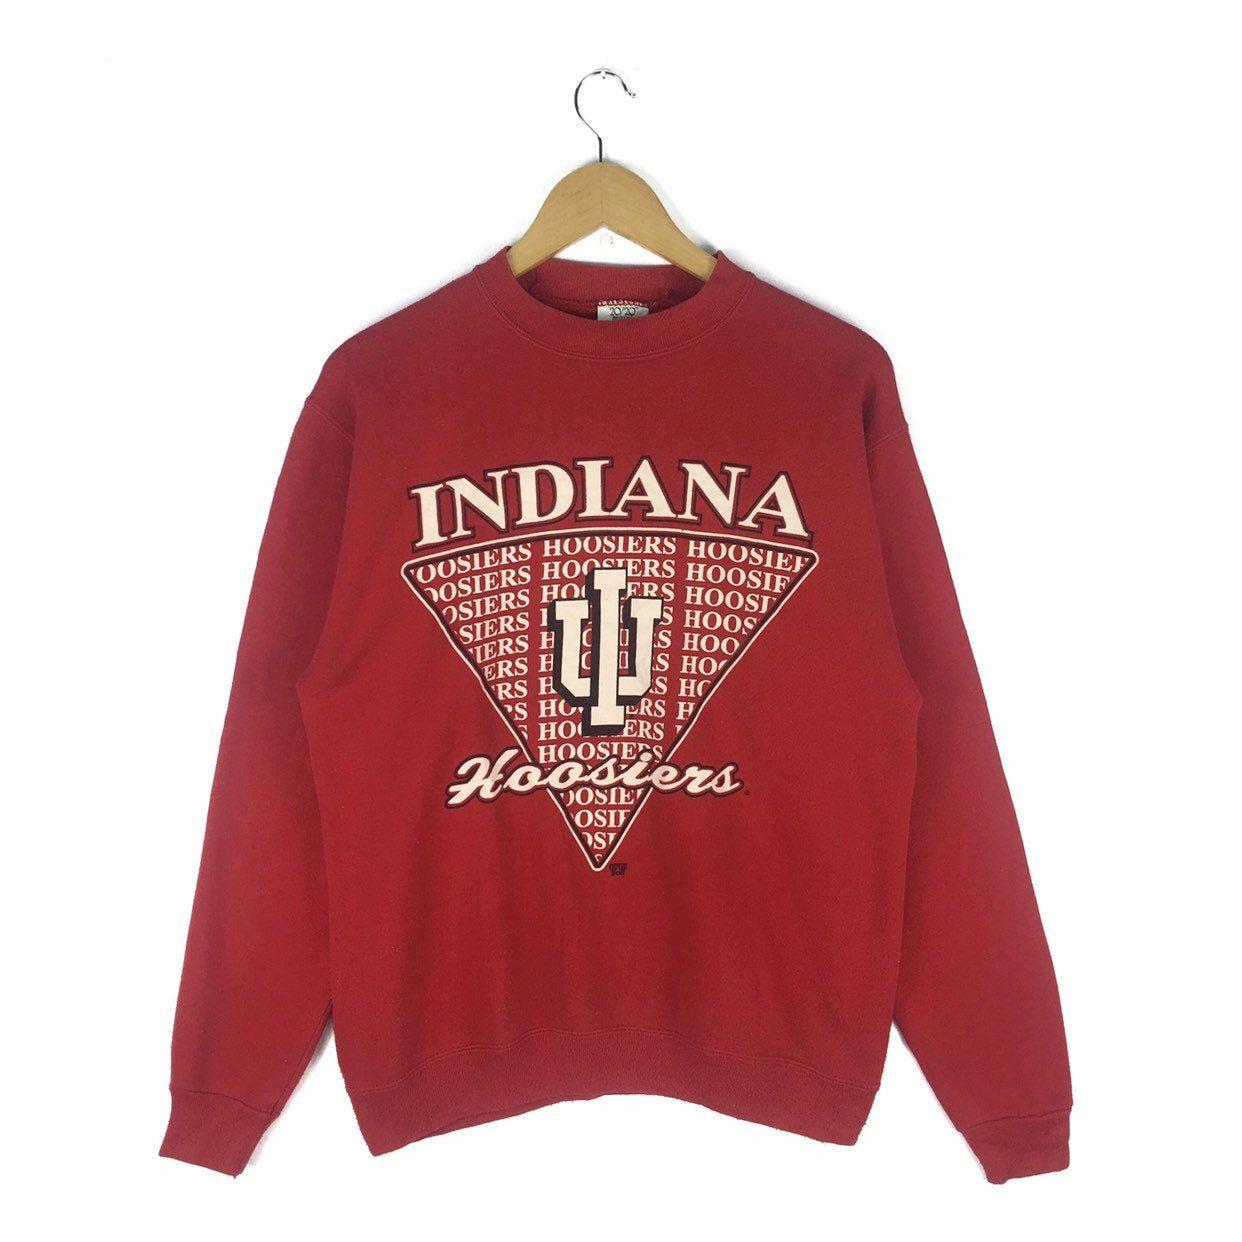 Vintage 90s Indiana University Hoosiers Sweatshirt Crewneck Etsy Vintage College Sweatshirts Sweatshirts Vintage Crewneck Sweatshirt [ 1242 x 1242 Pixel ]